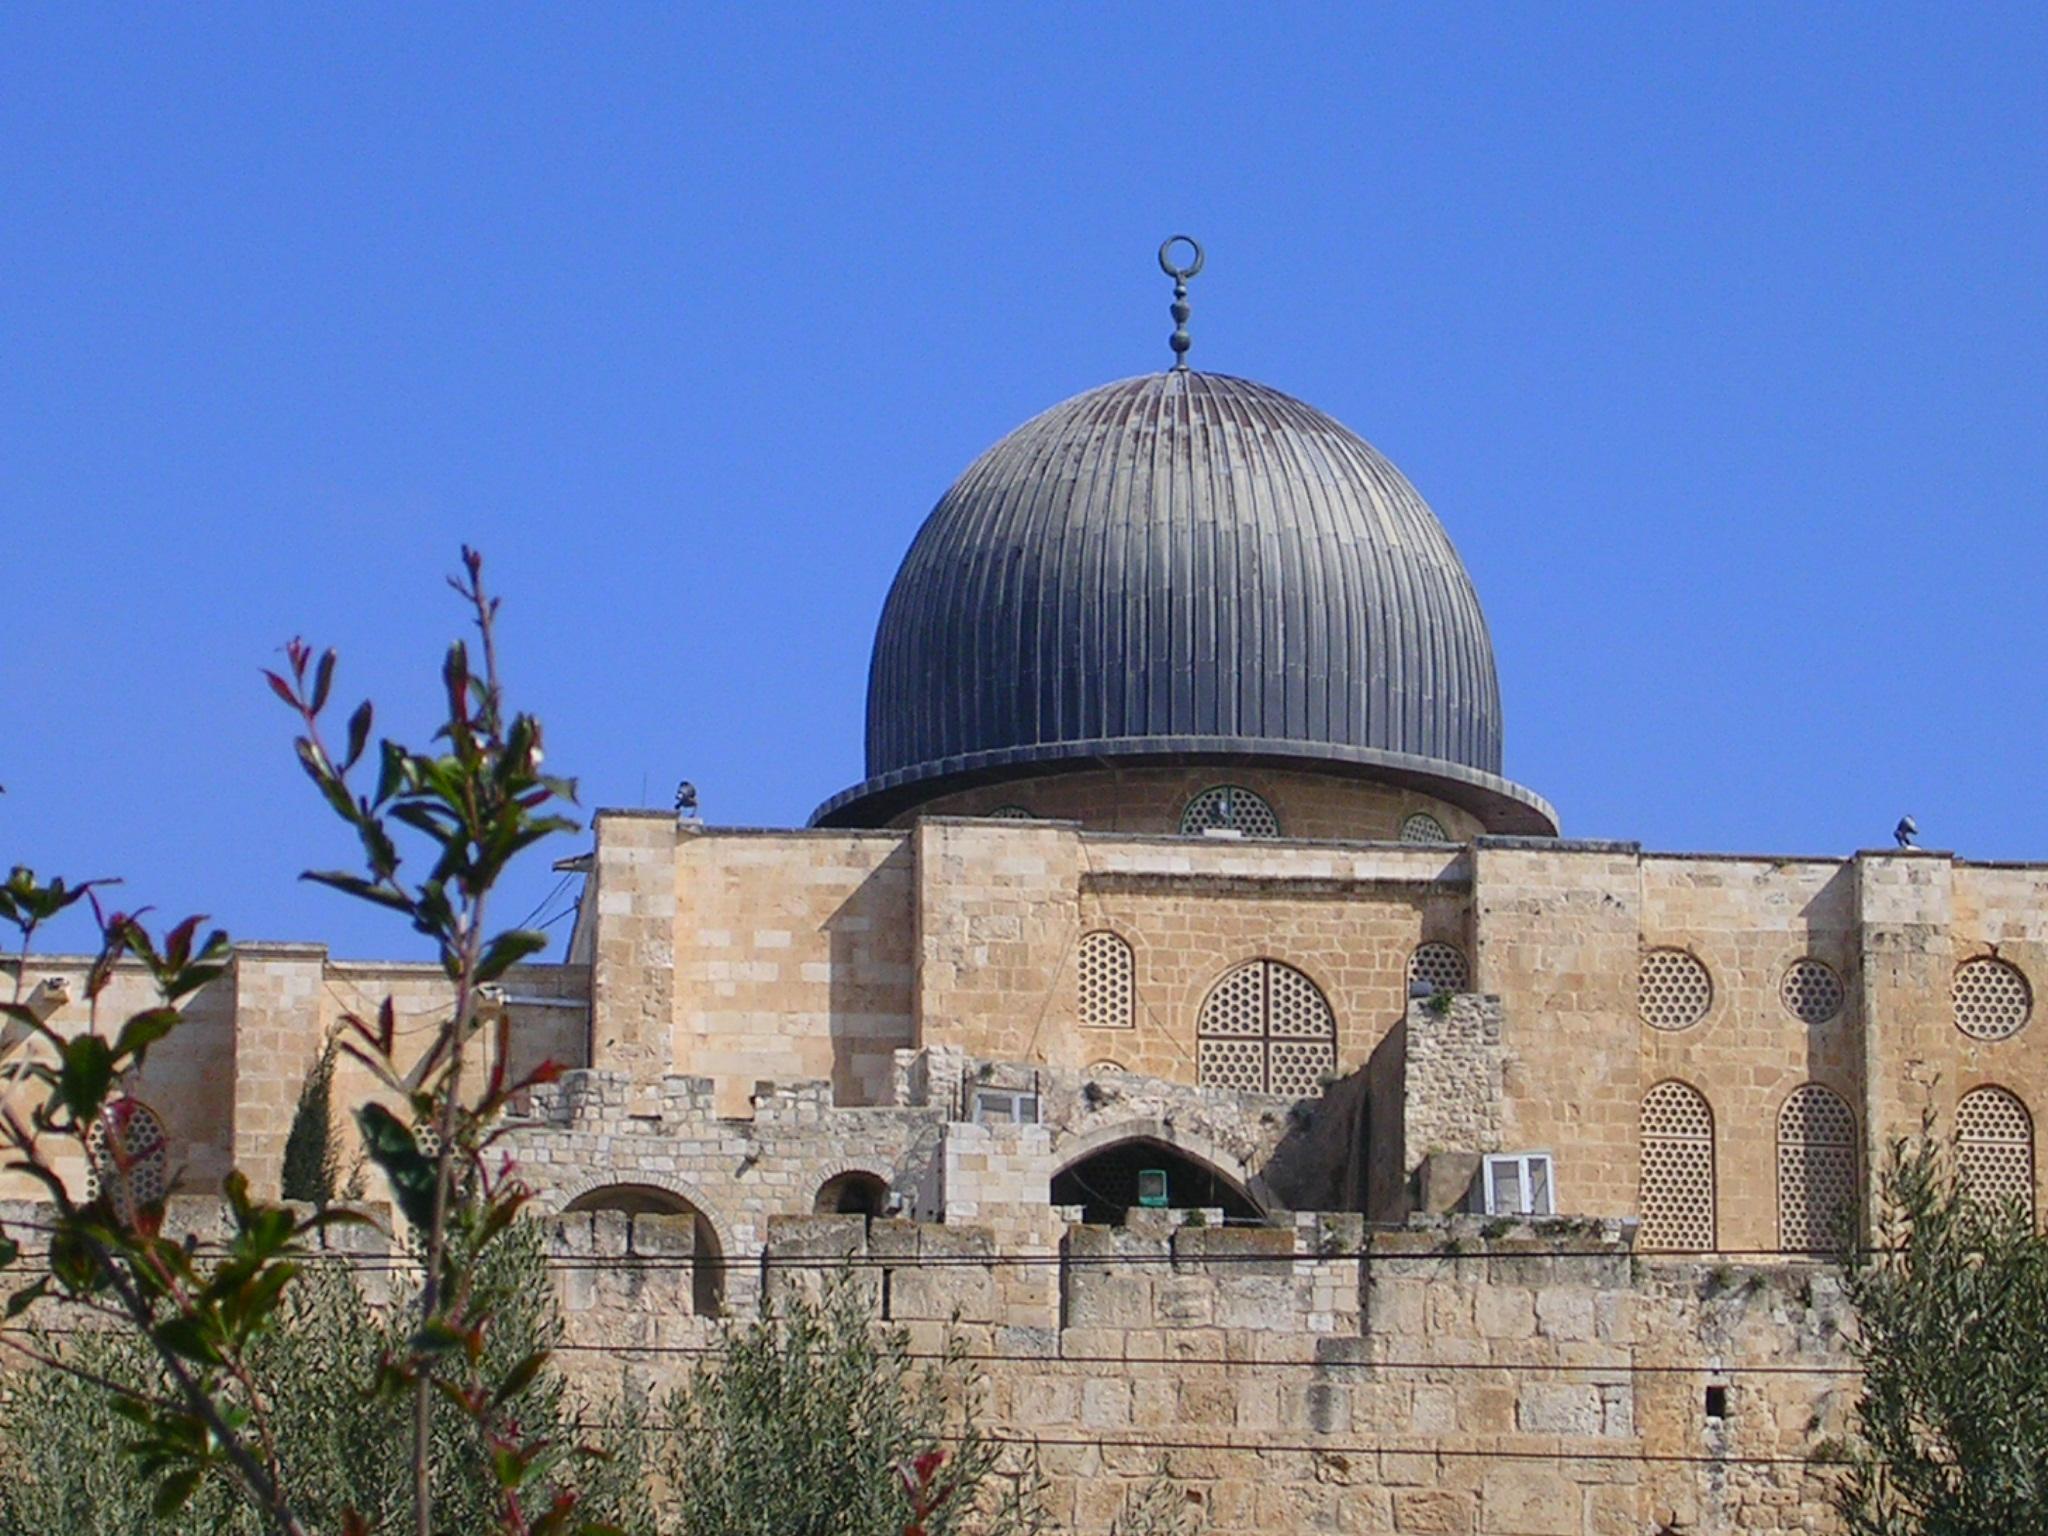 سلام بر مسجد الاقصی مظلوم